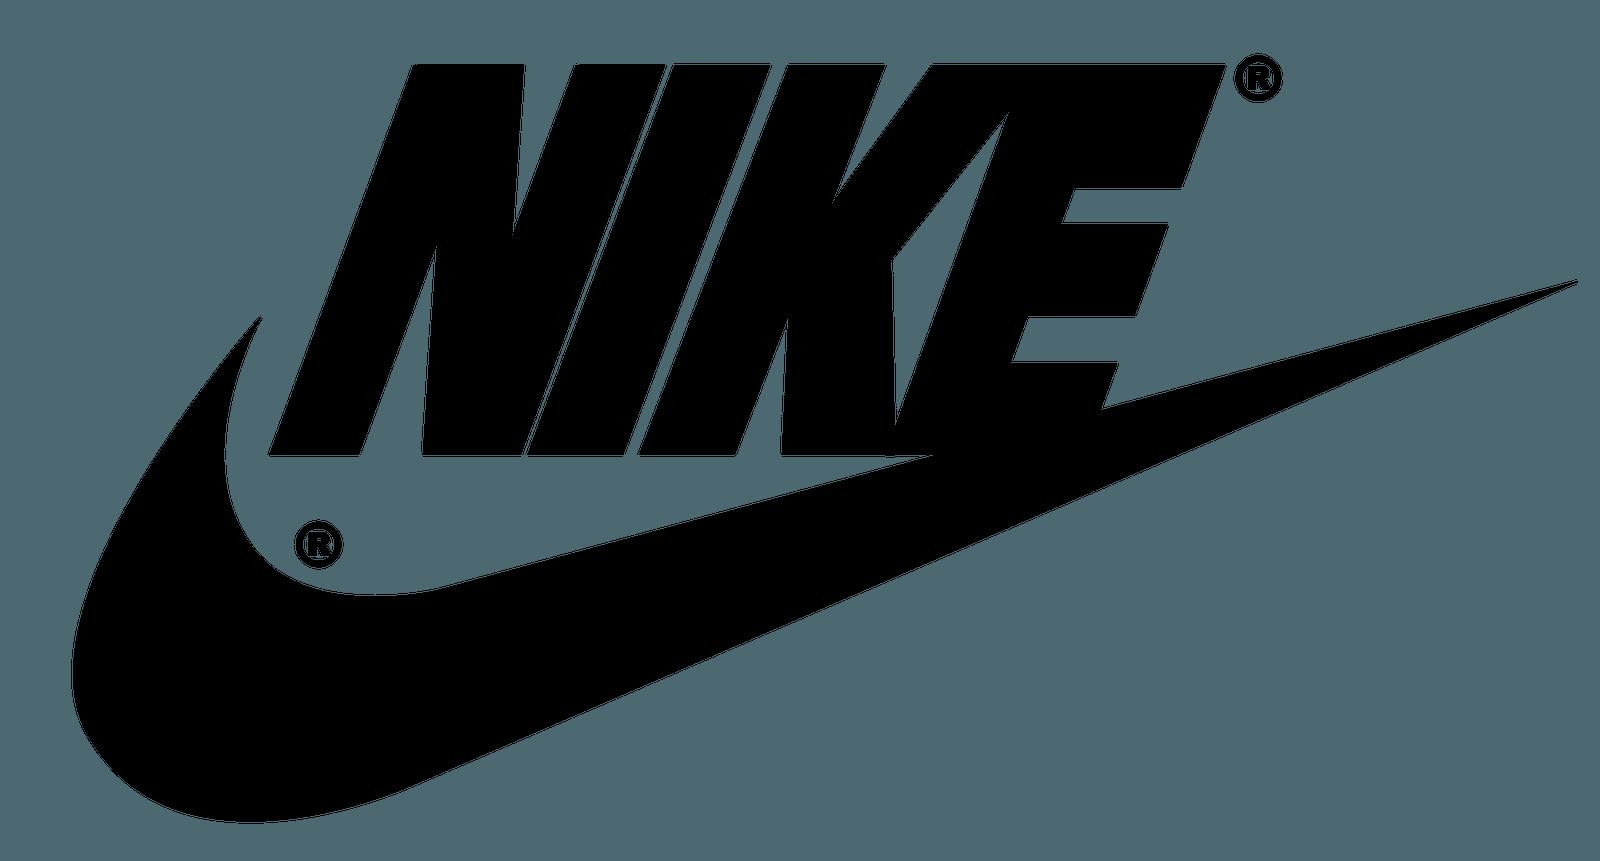 nike logos and schuhe - photo #2